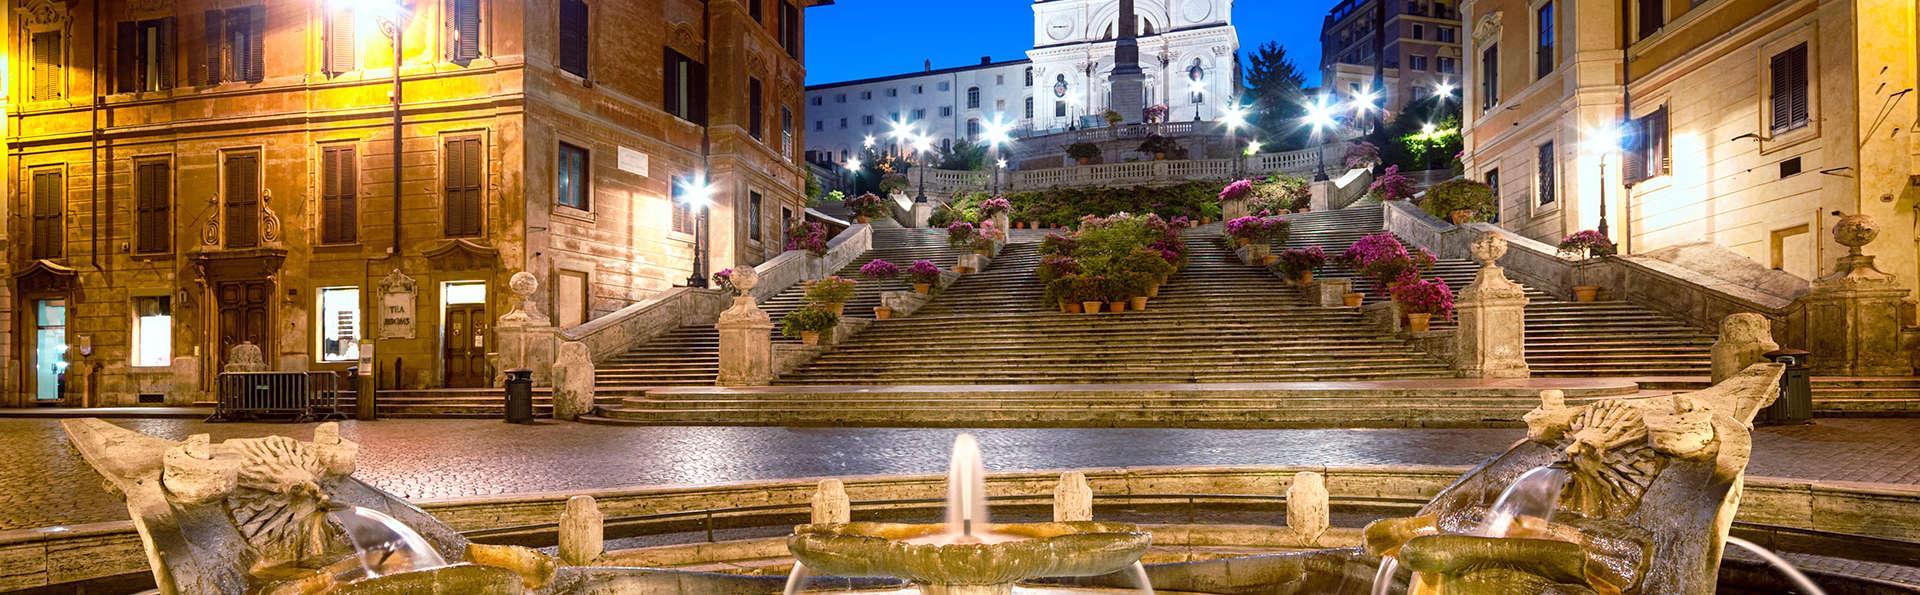 Oly Hotel - Edit_Piazza-di-Spagna-2.jpg